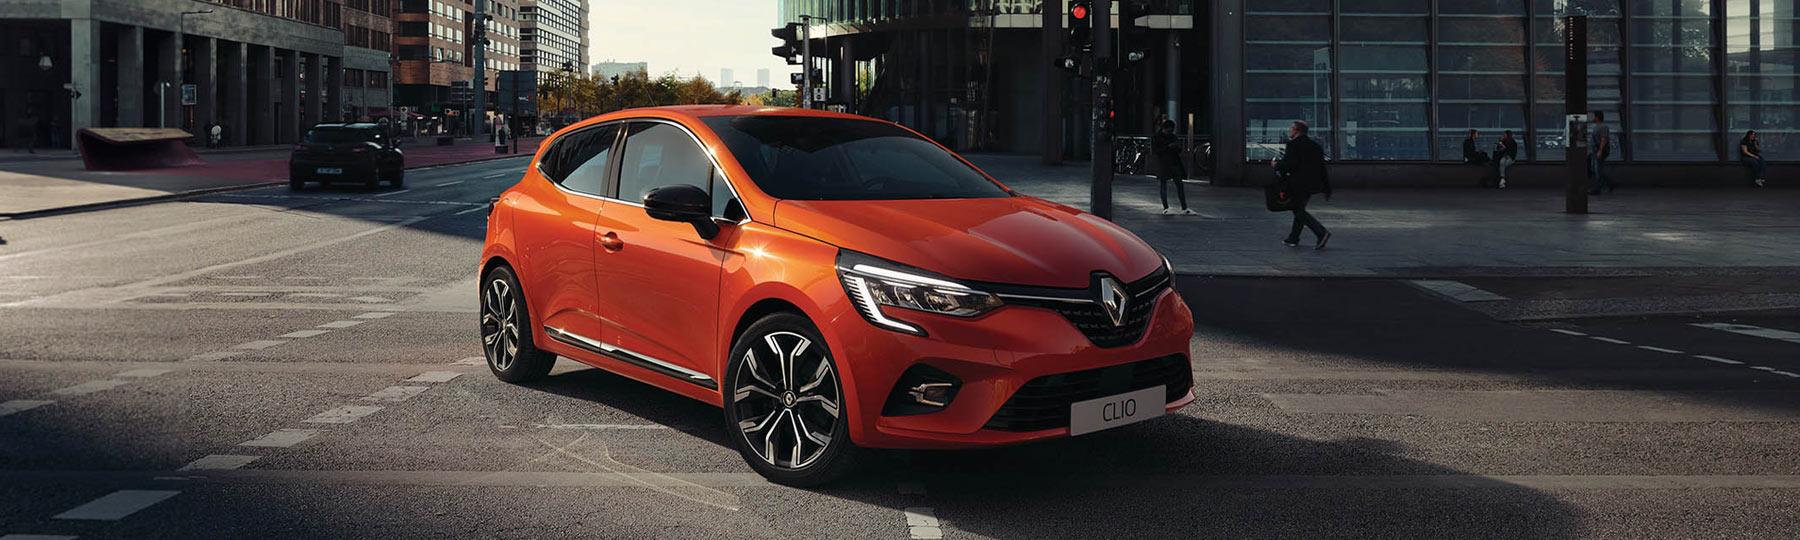 New Renault Clio